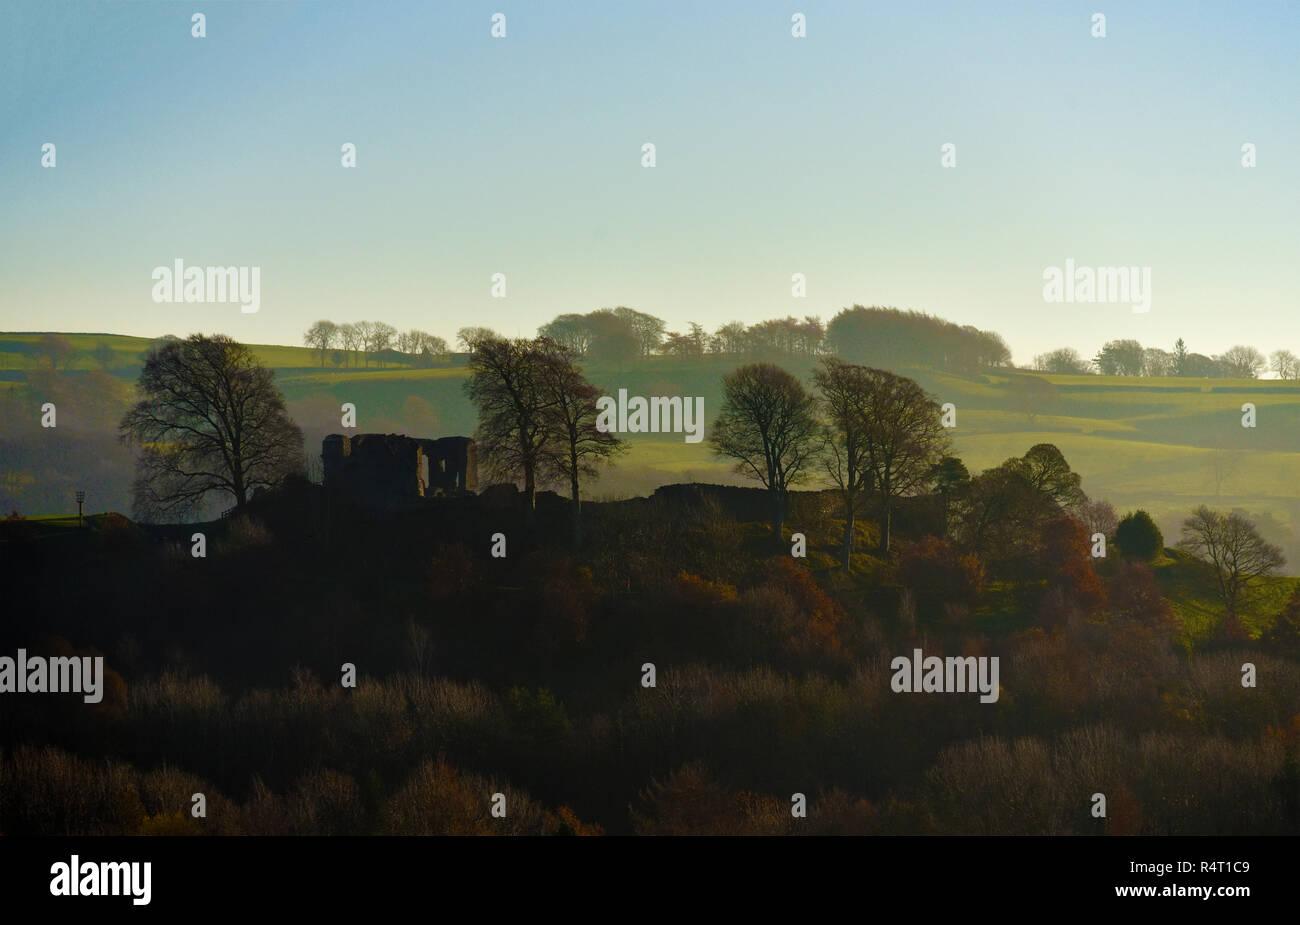 Kendal Castle, Kendal, Cumbria, England, United Kingdom, Europe. - Stock Image